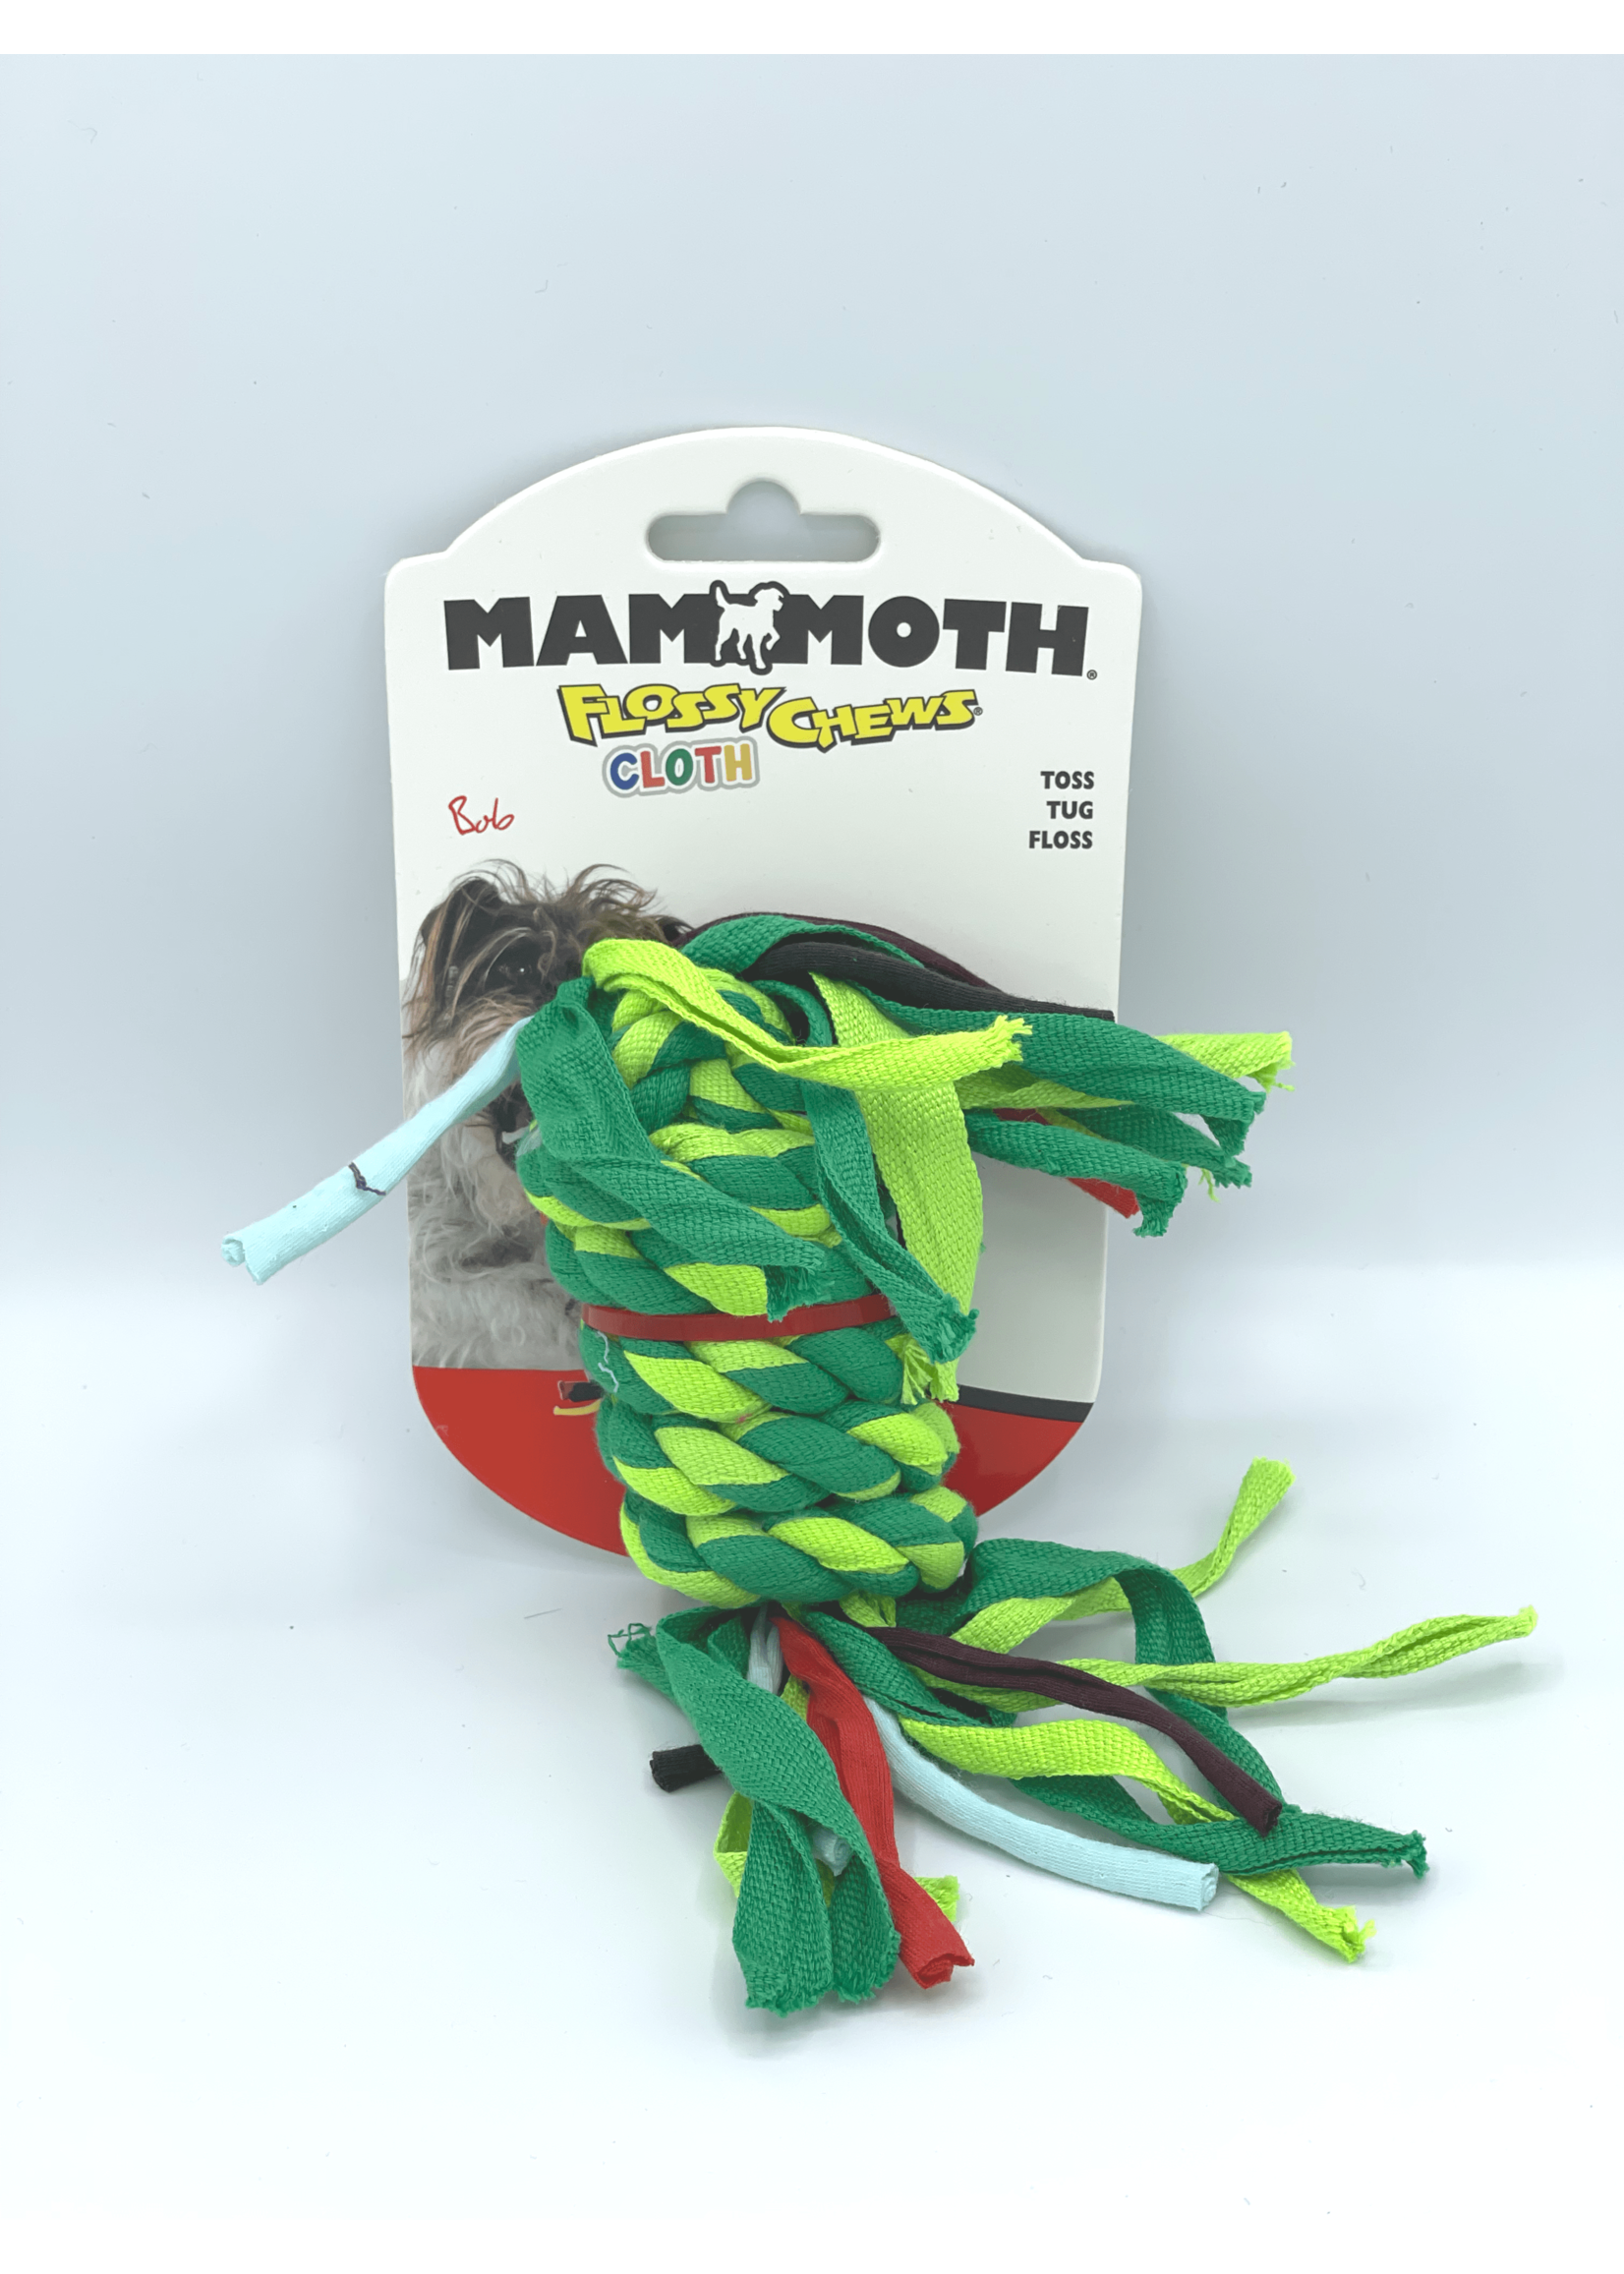 Mammoth Mammoth Flossy Chews Cloth Rope Small